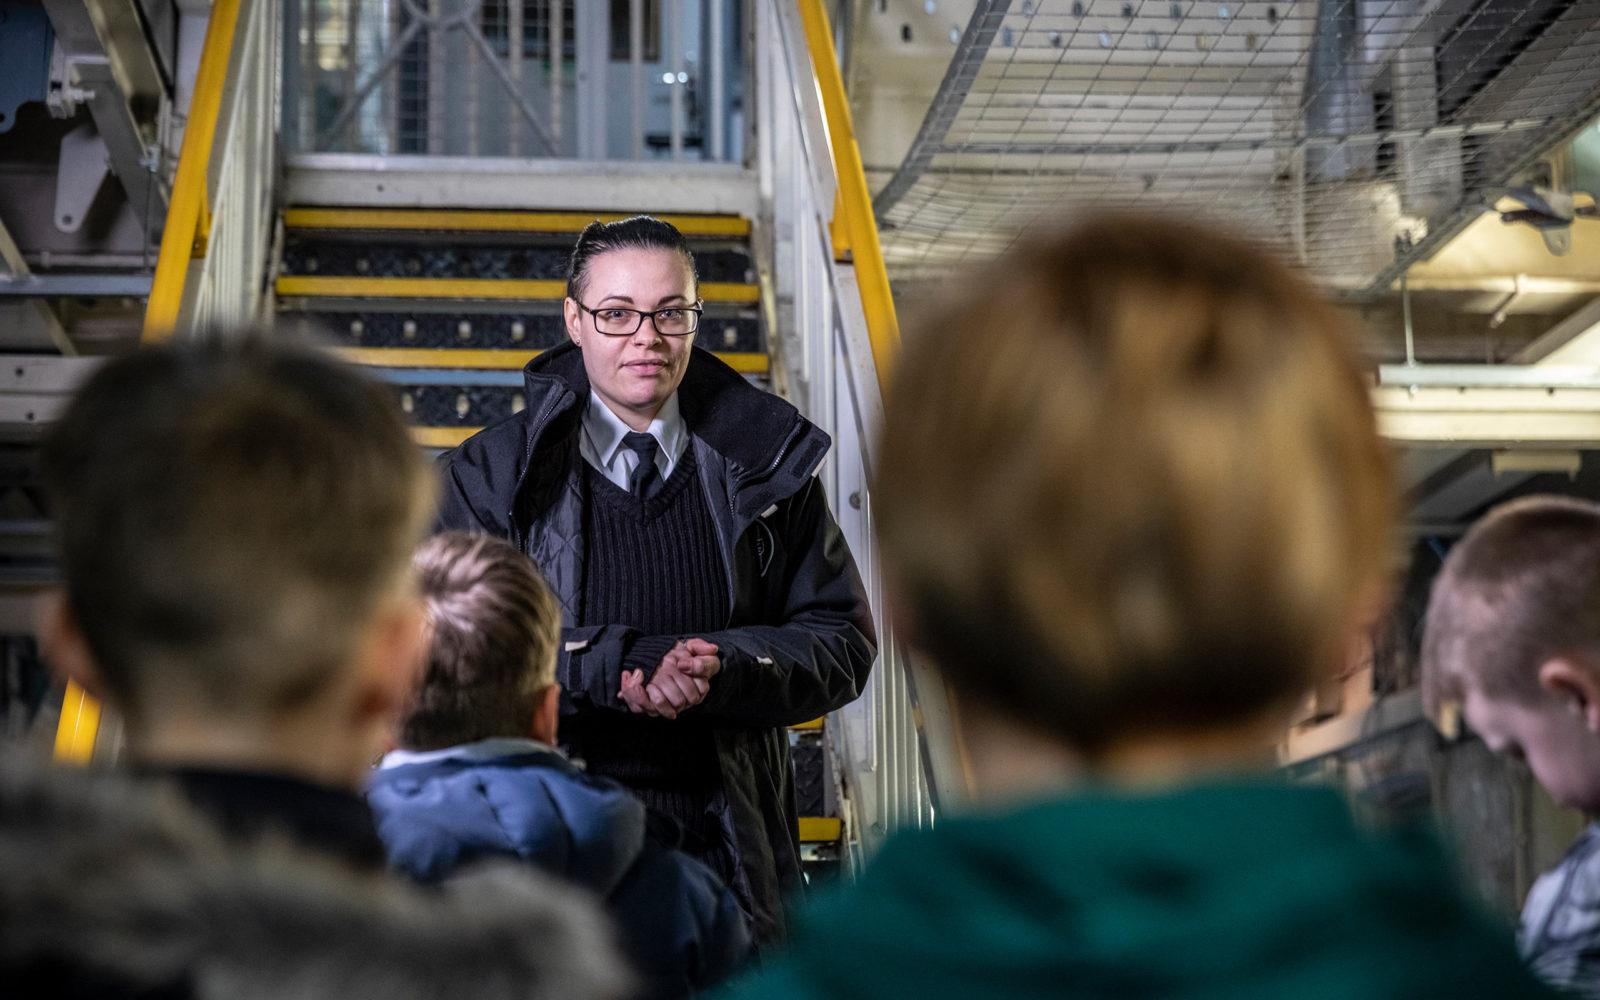 Shepton Mallet Prison Educational Groups